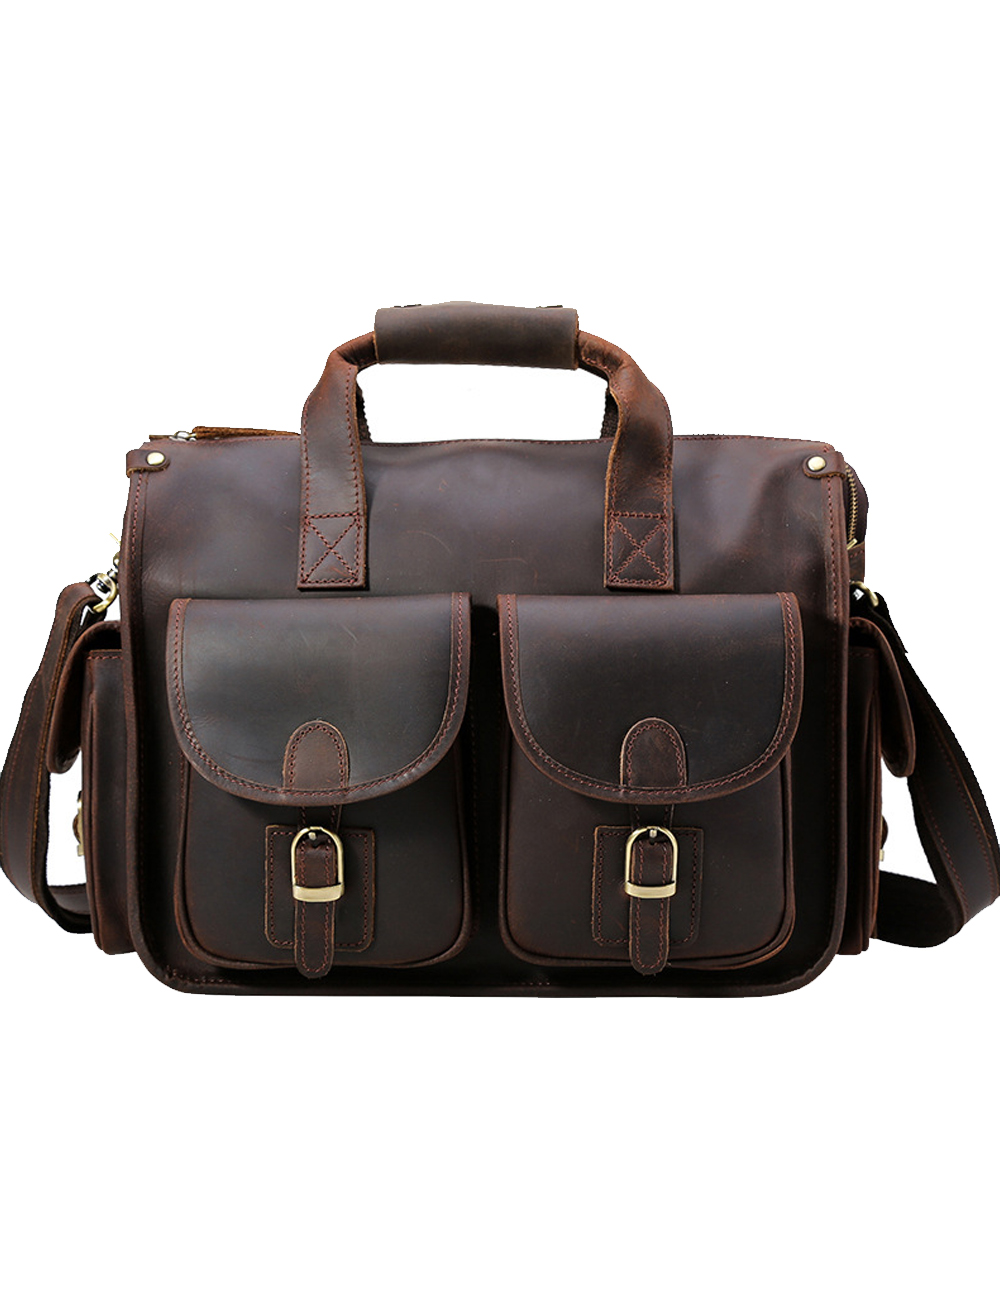 Для мужчин schwear Для мужчин из натуральной кожи Multi карман сумка через плечо Сумочка 40 см